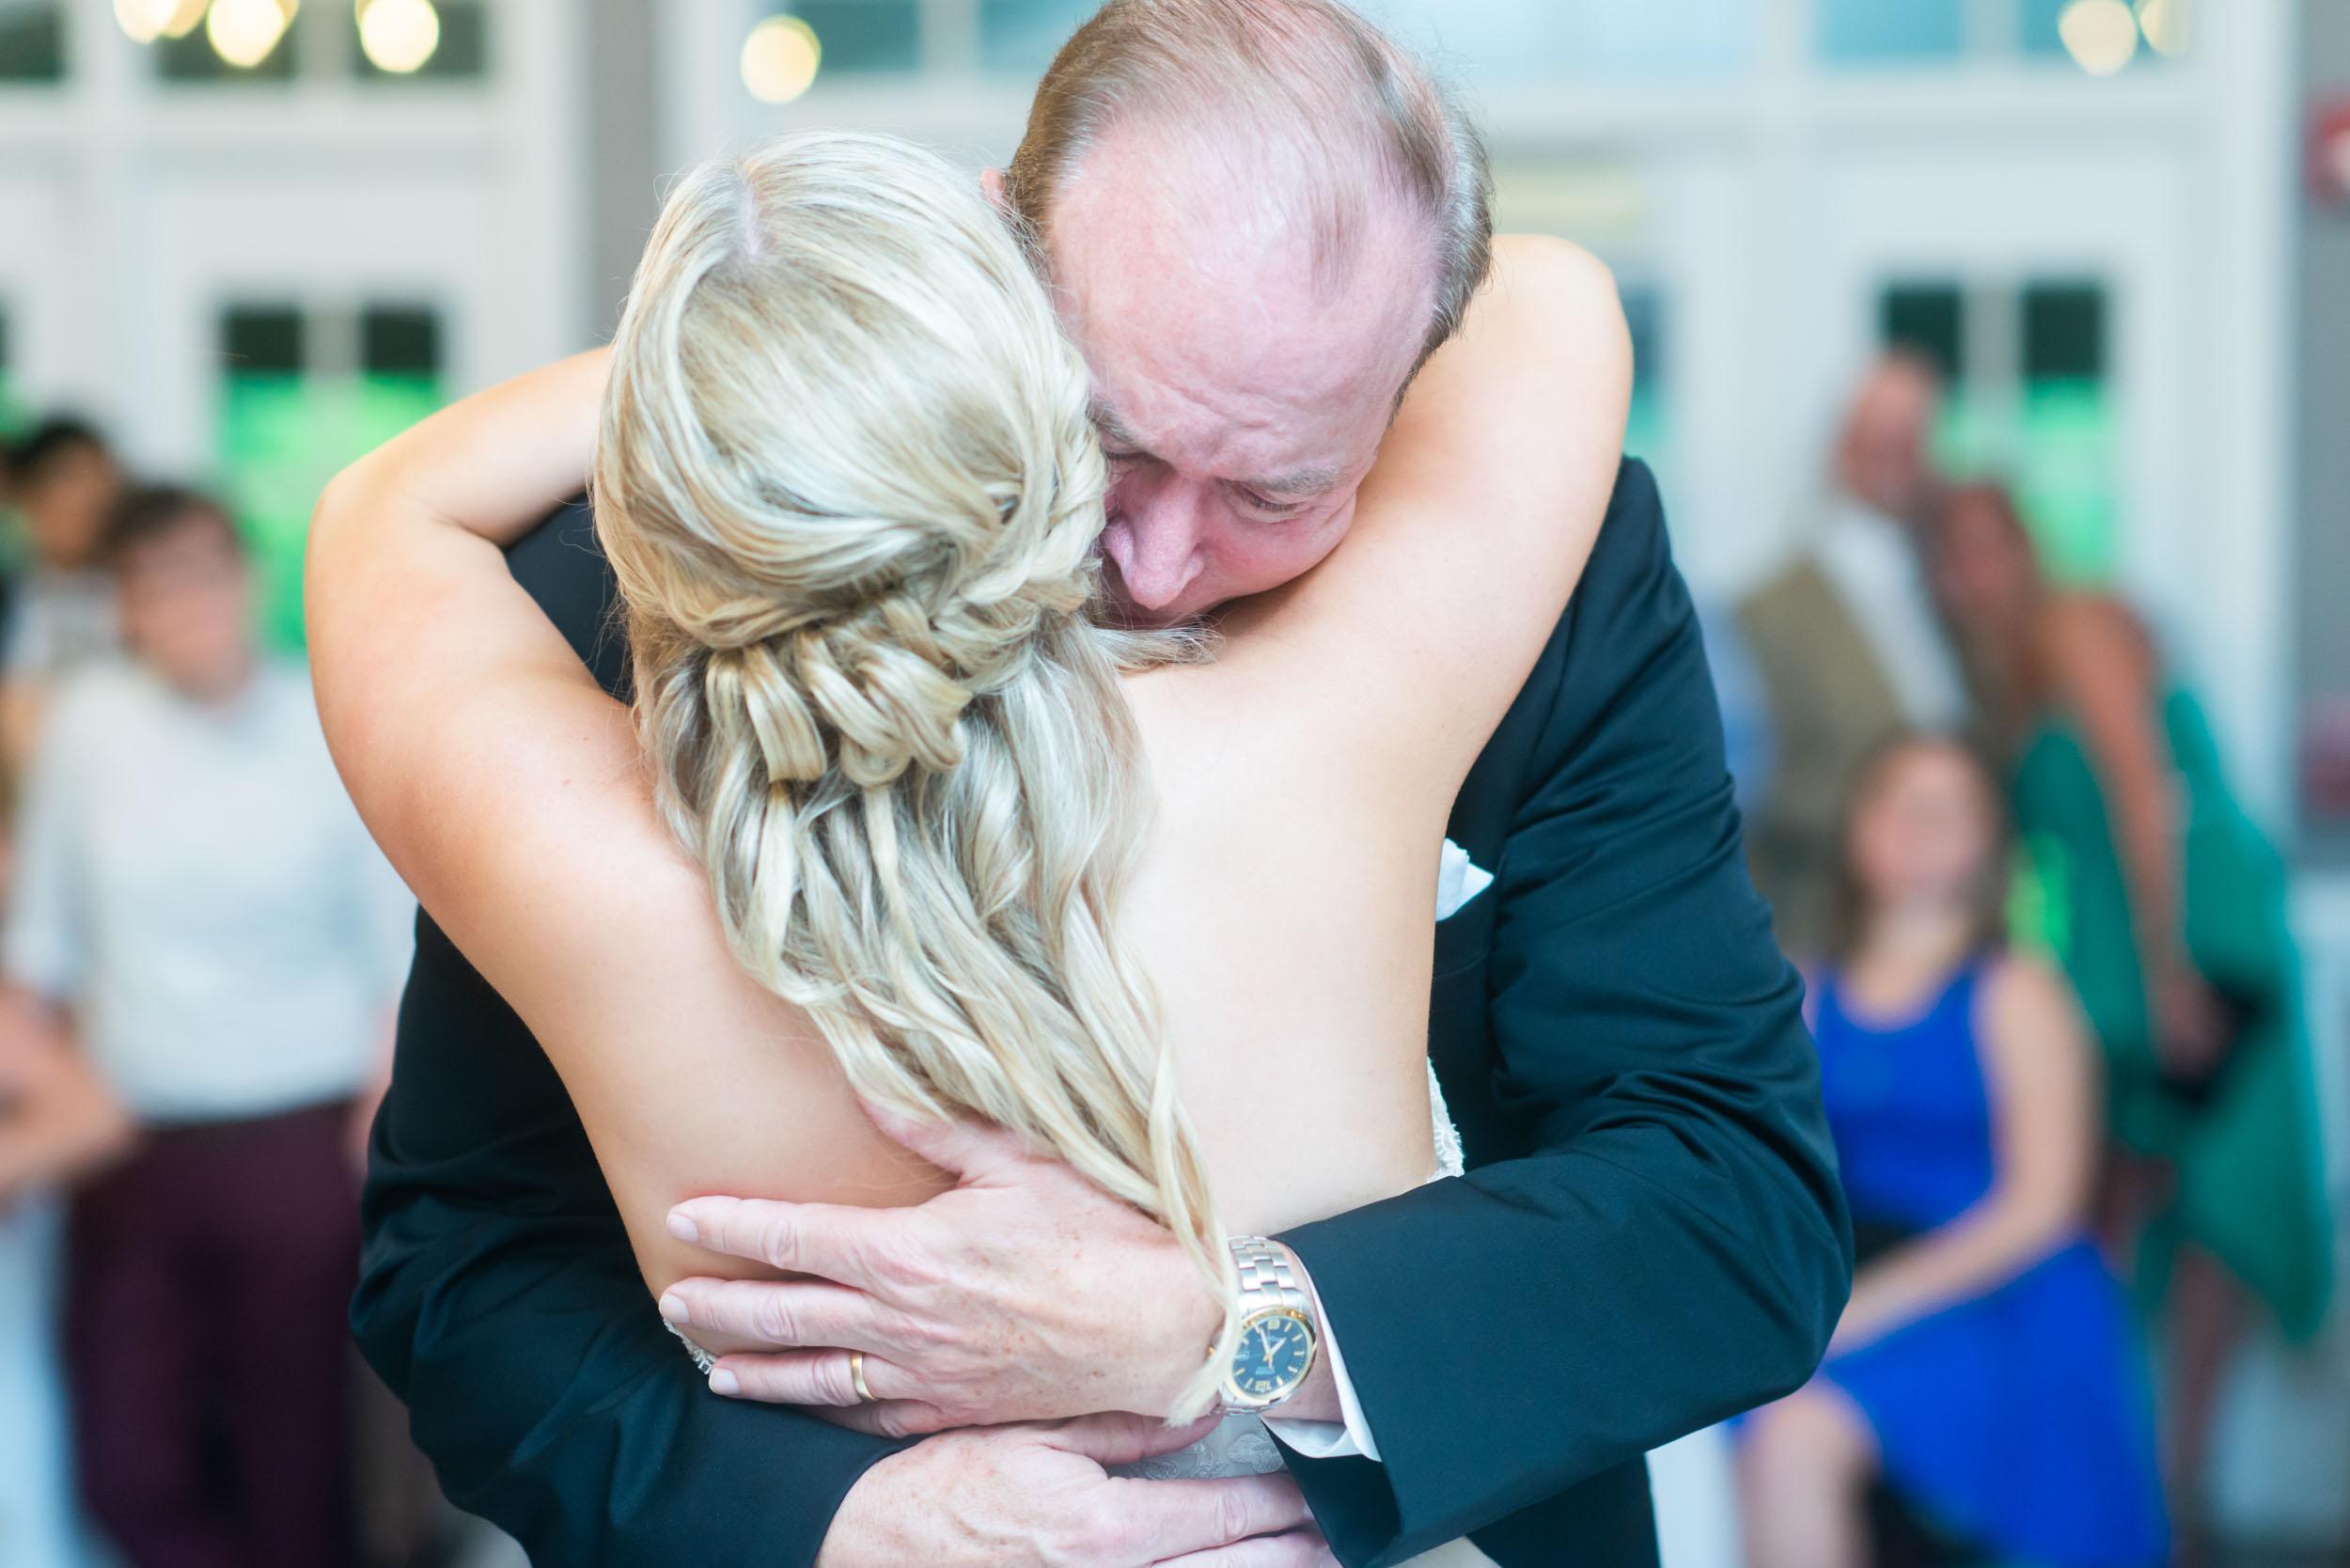 dc+metro+wedding+photographer+vadym+guliuk+photography+wedding+parent+dances-2031.jpg